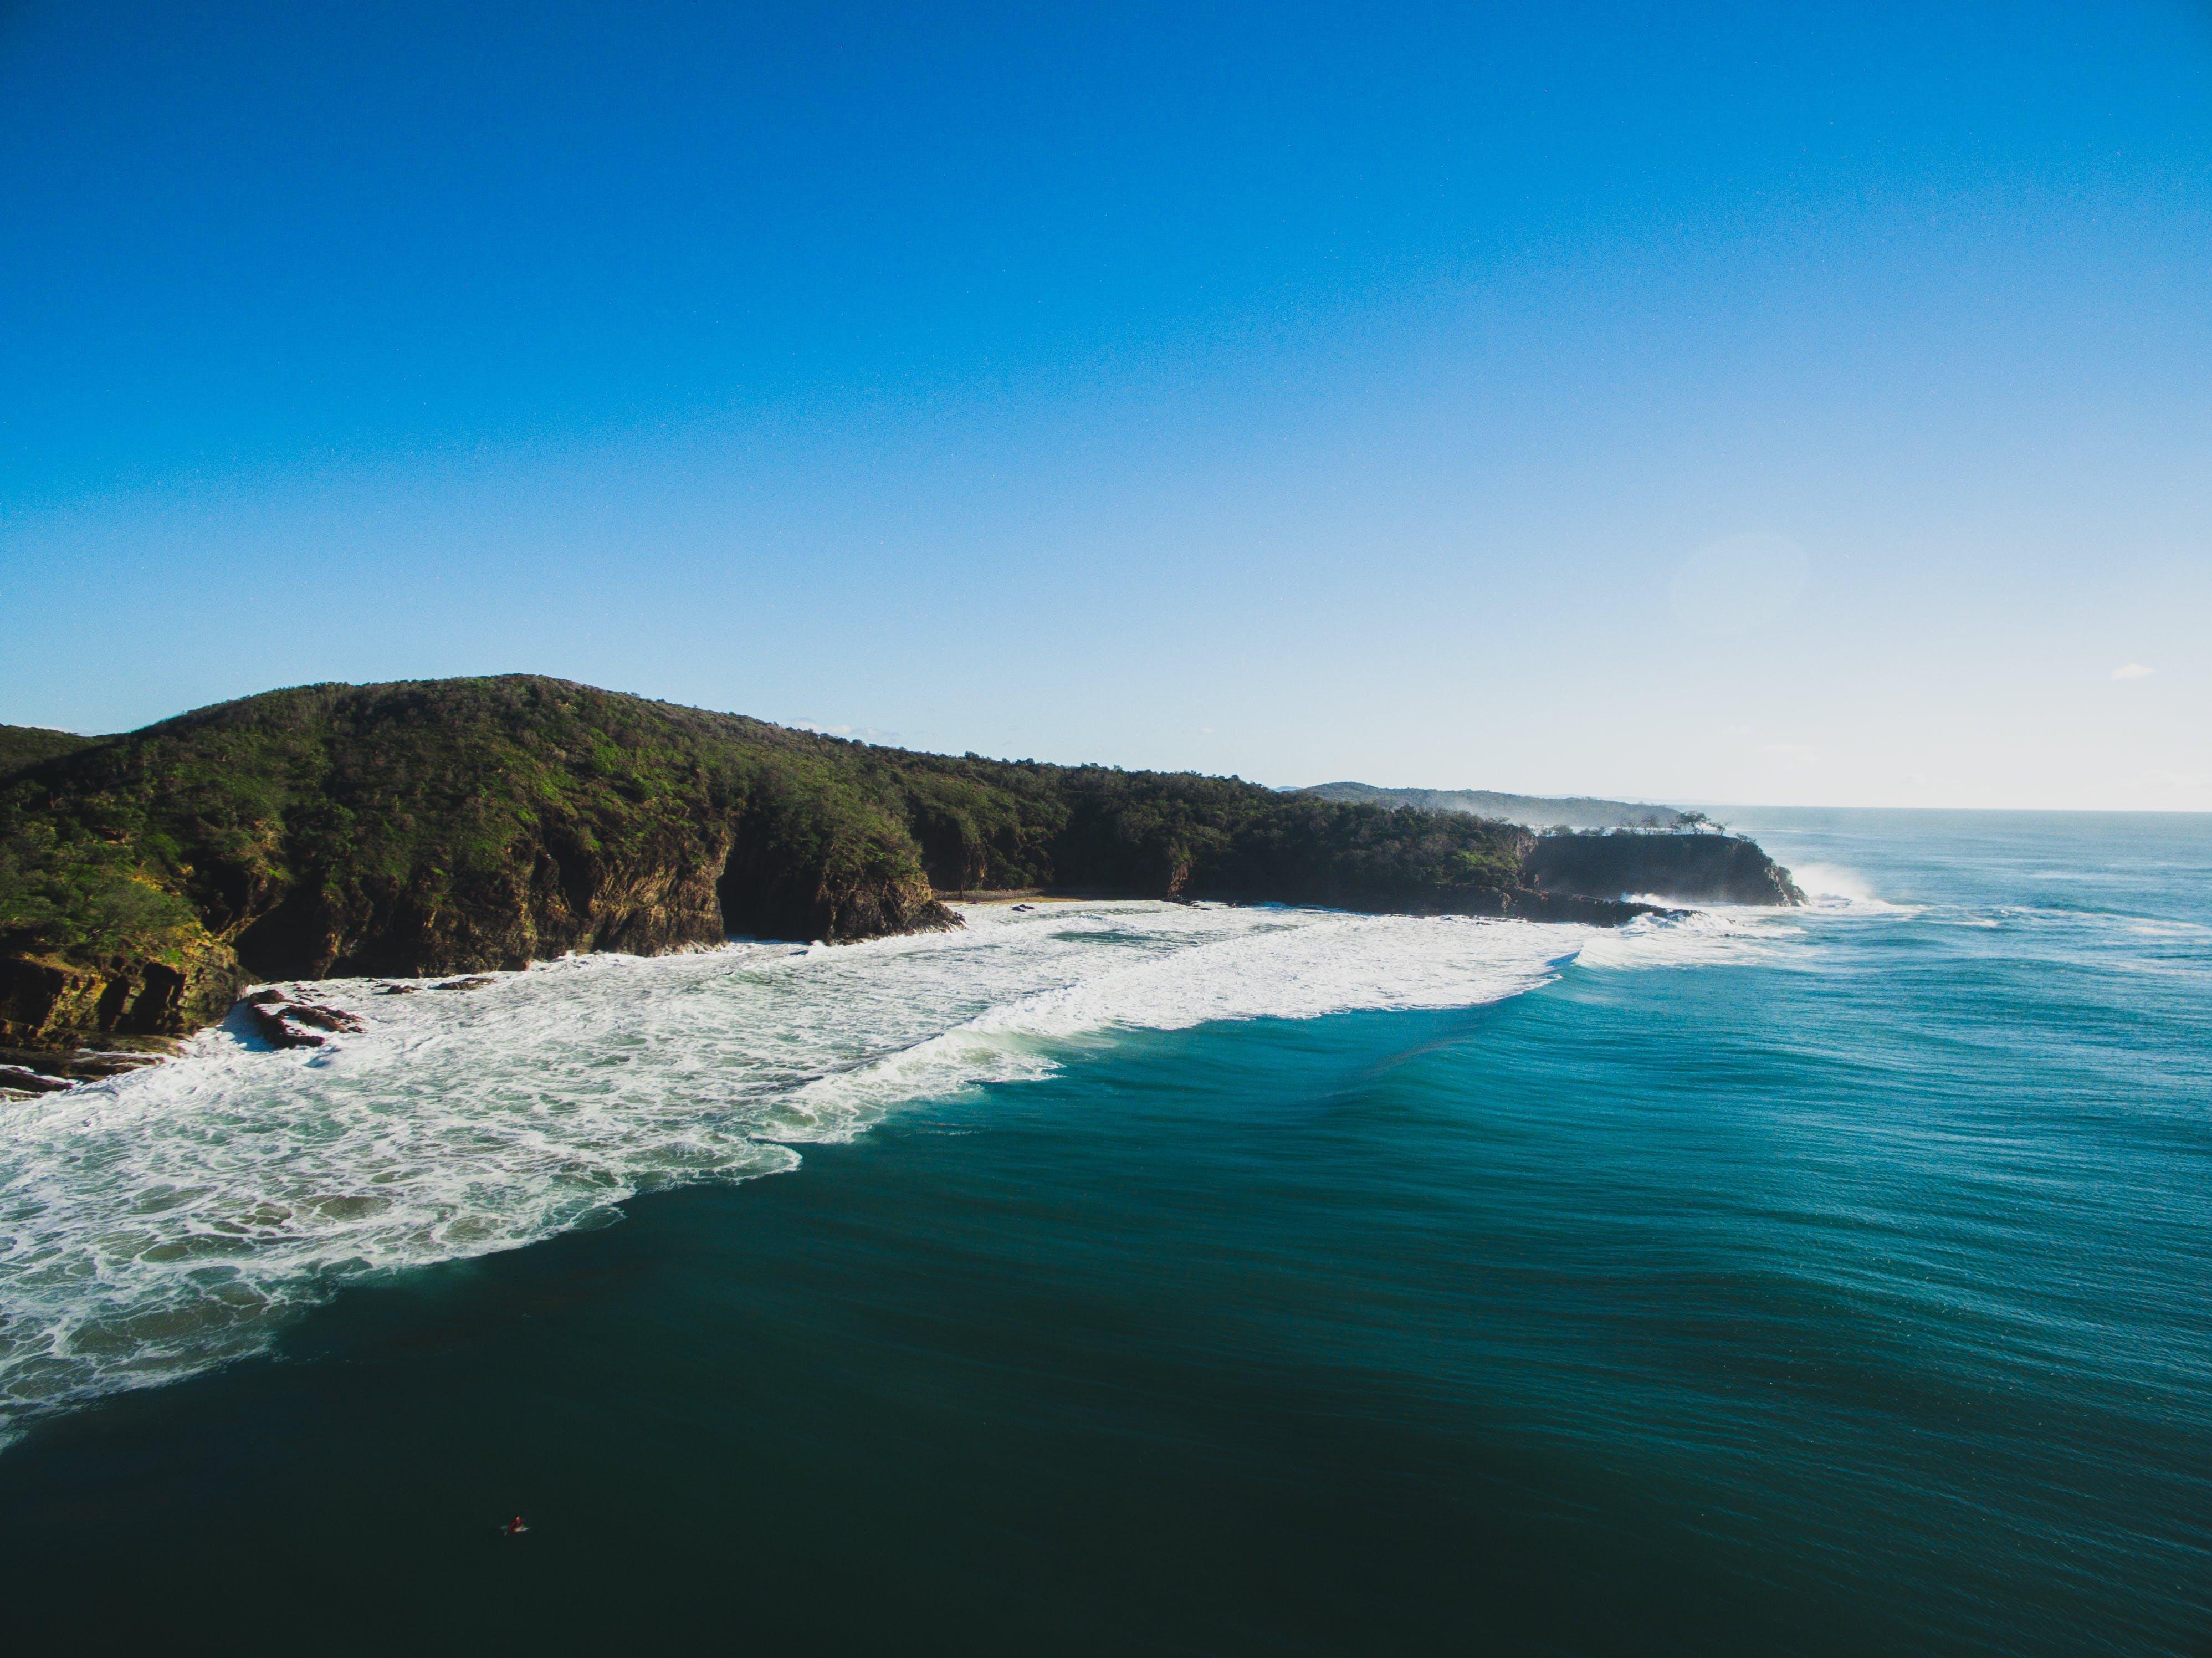 Free stock photo of beach, coast line, drone, ocean